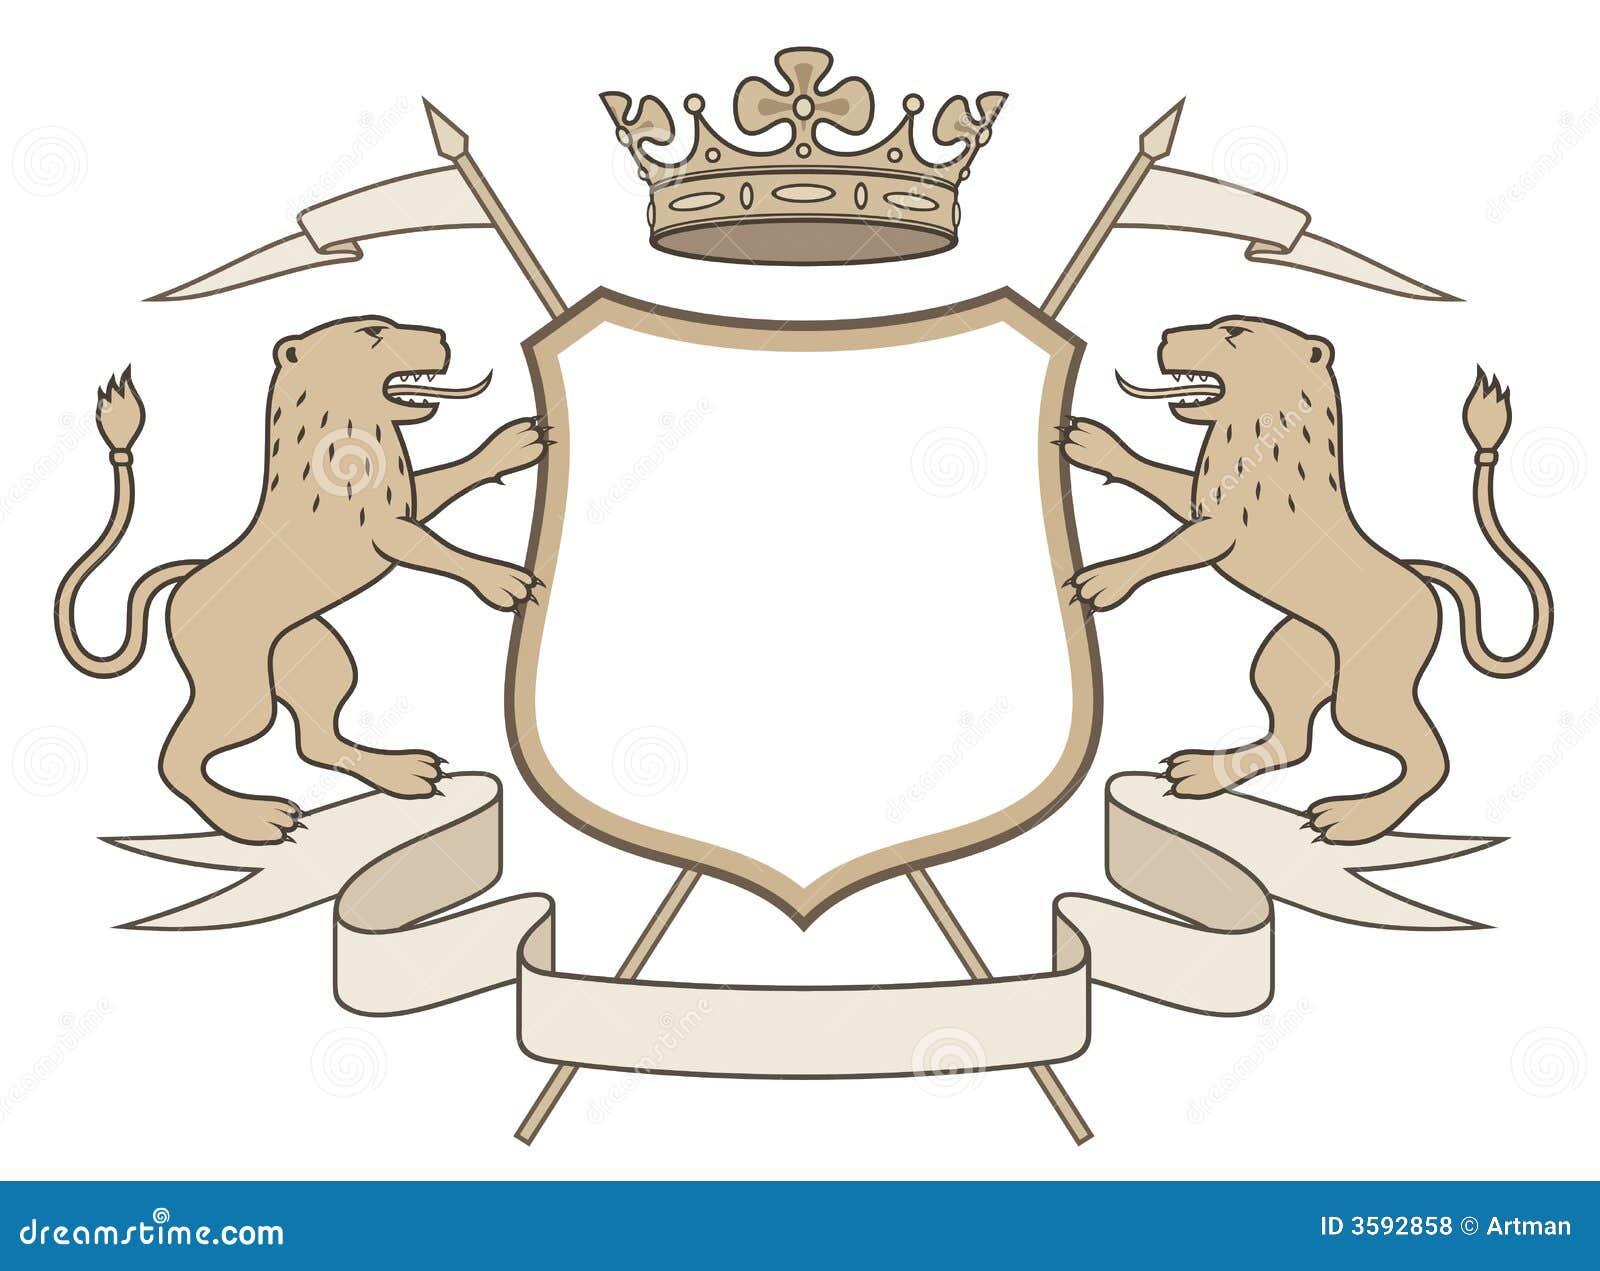 Lion With Crown Car Logo Heraldic emblem  crown  amp  lionsLion With Crown Car Logo